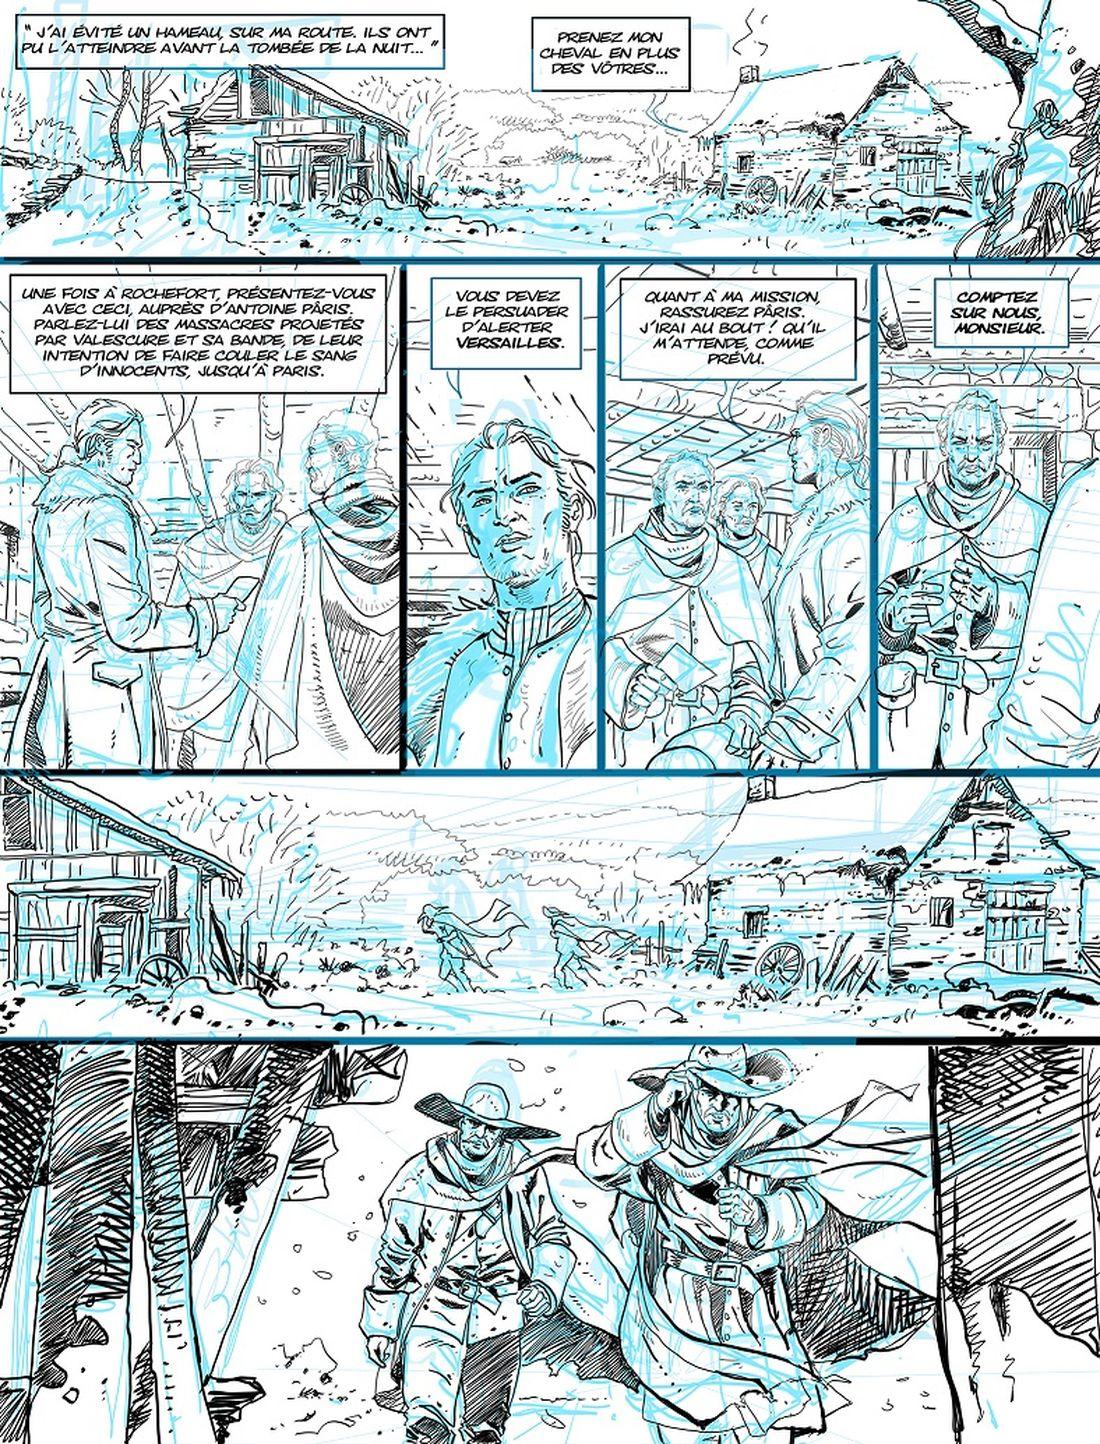 Hyver, tome 2, storyboard de la planche 30 © Philippe Xavier / Nathalie Sergeef